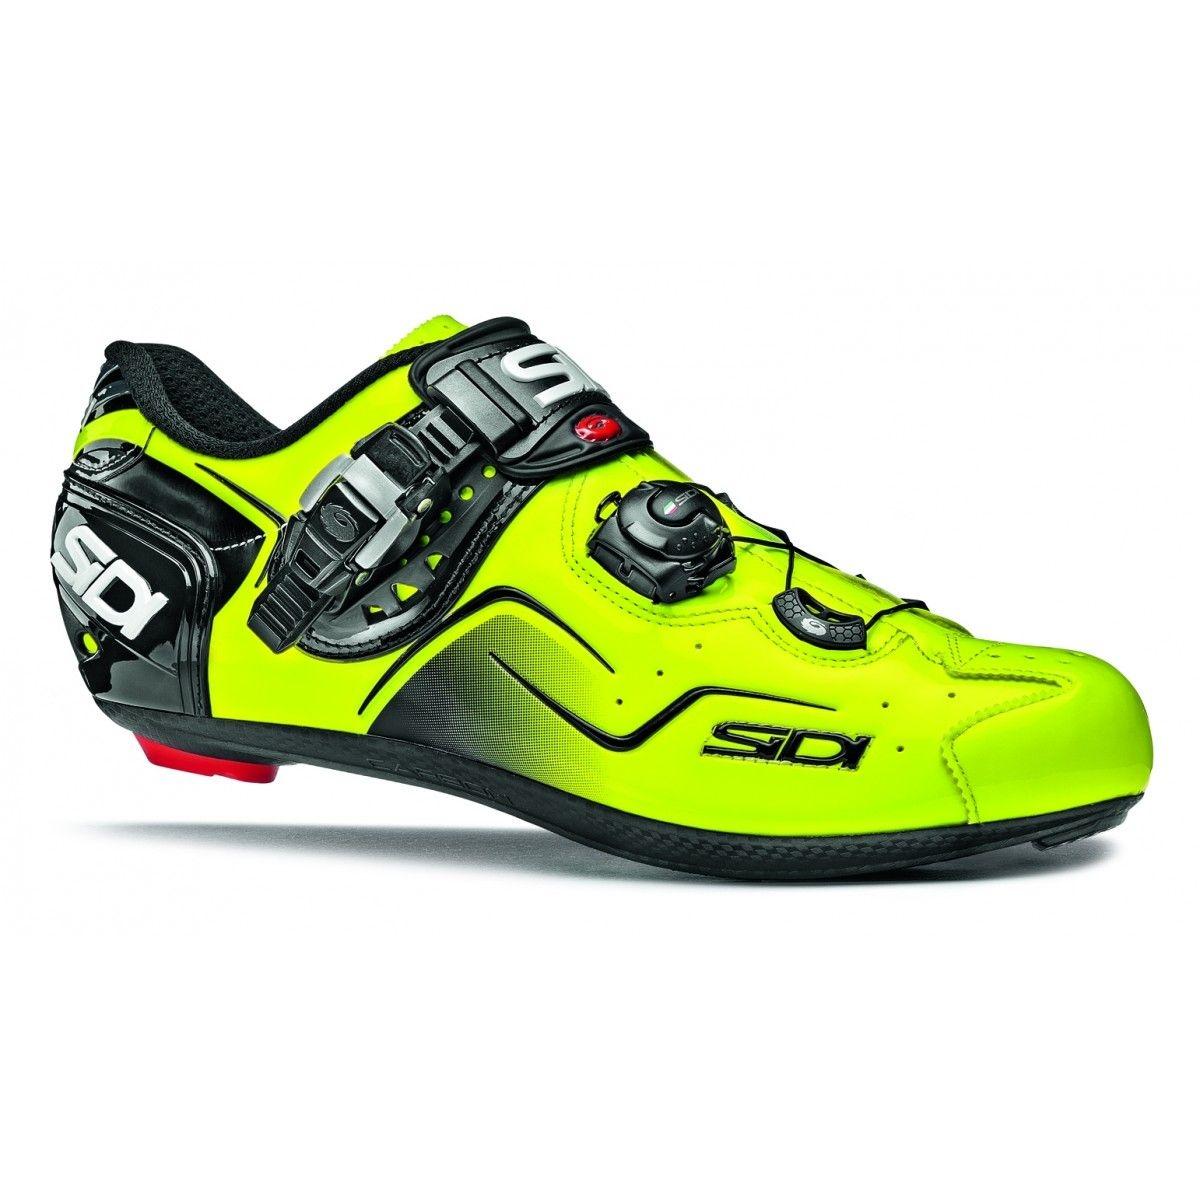 Chaussures route KAOS Cyclisme Sidi